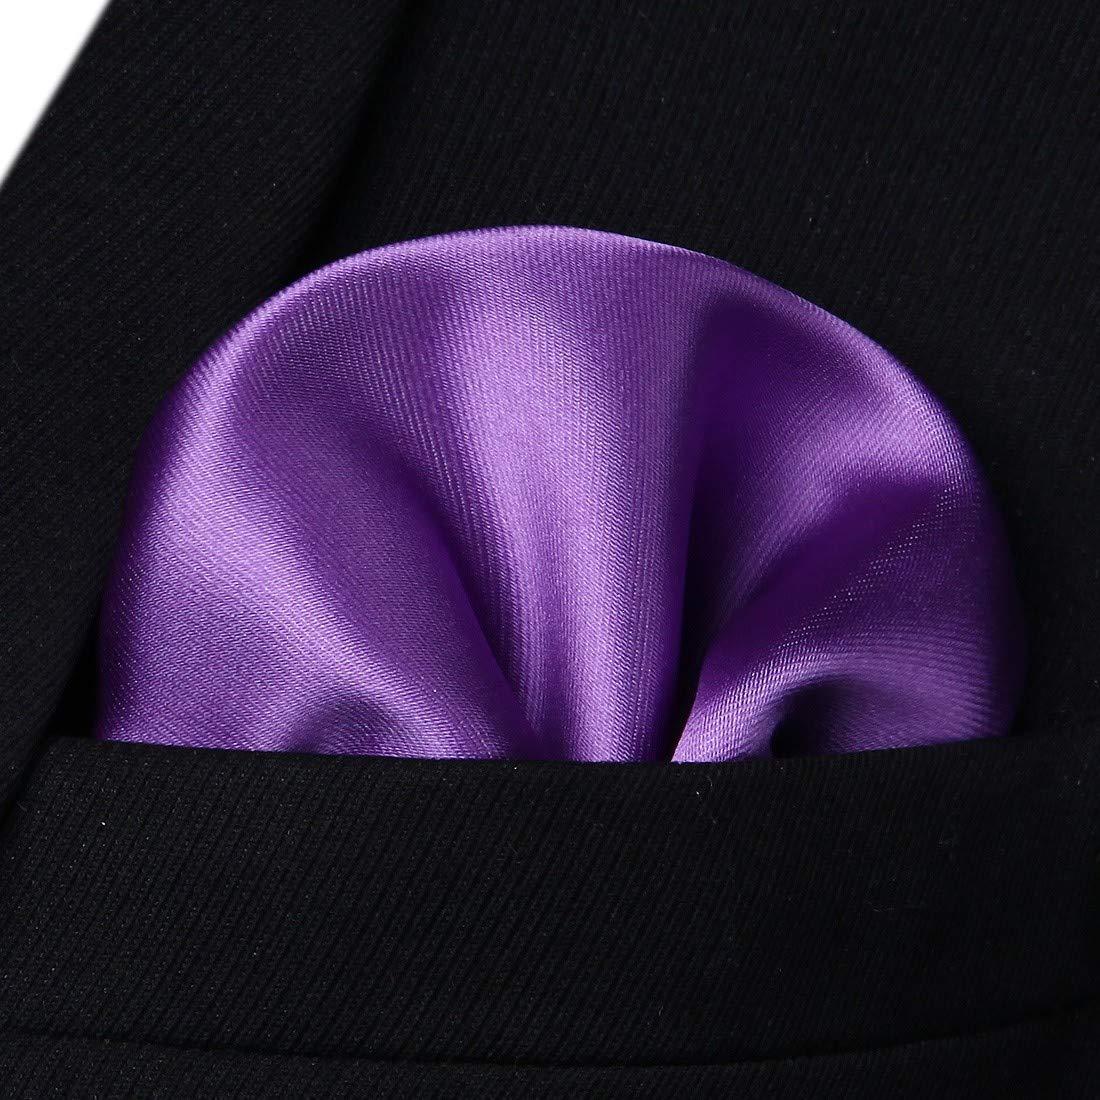 HISDERN Classic 6 Clips Suspenders and Bow Tie Set Y Shape Adjustable Braces SC614US3